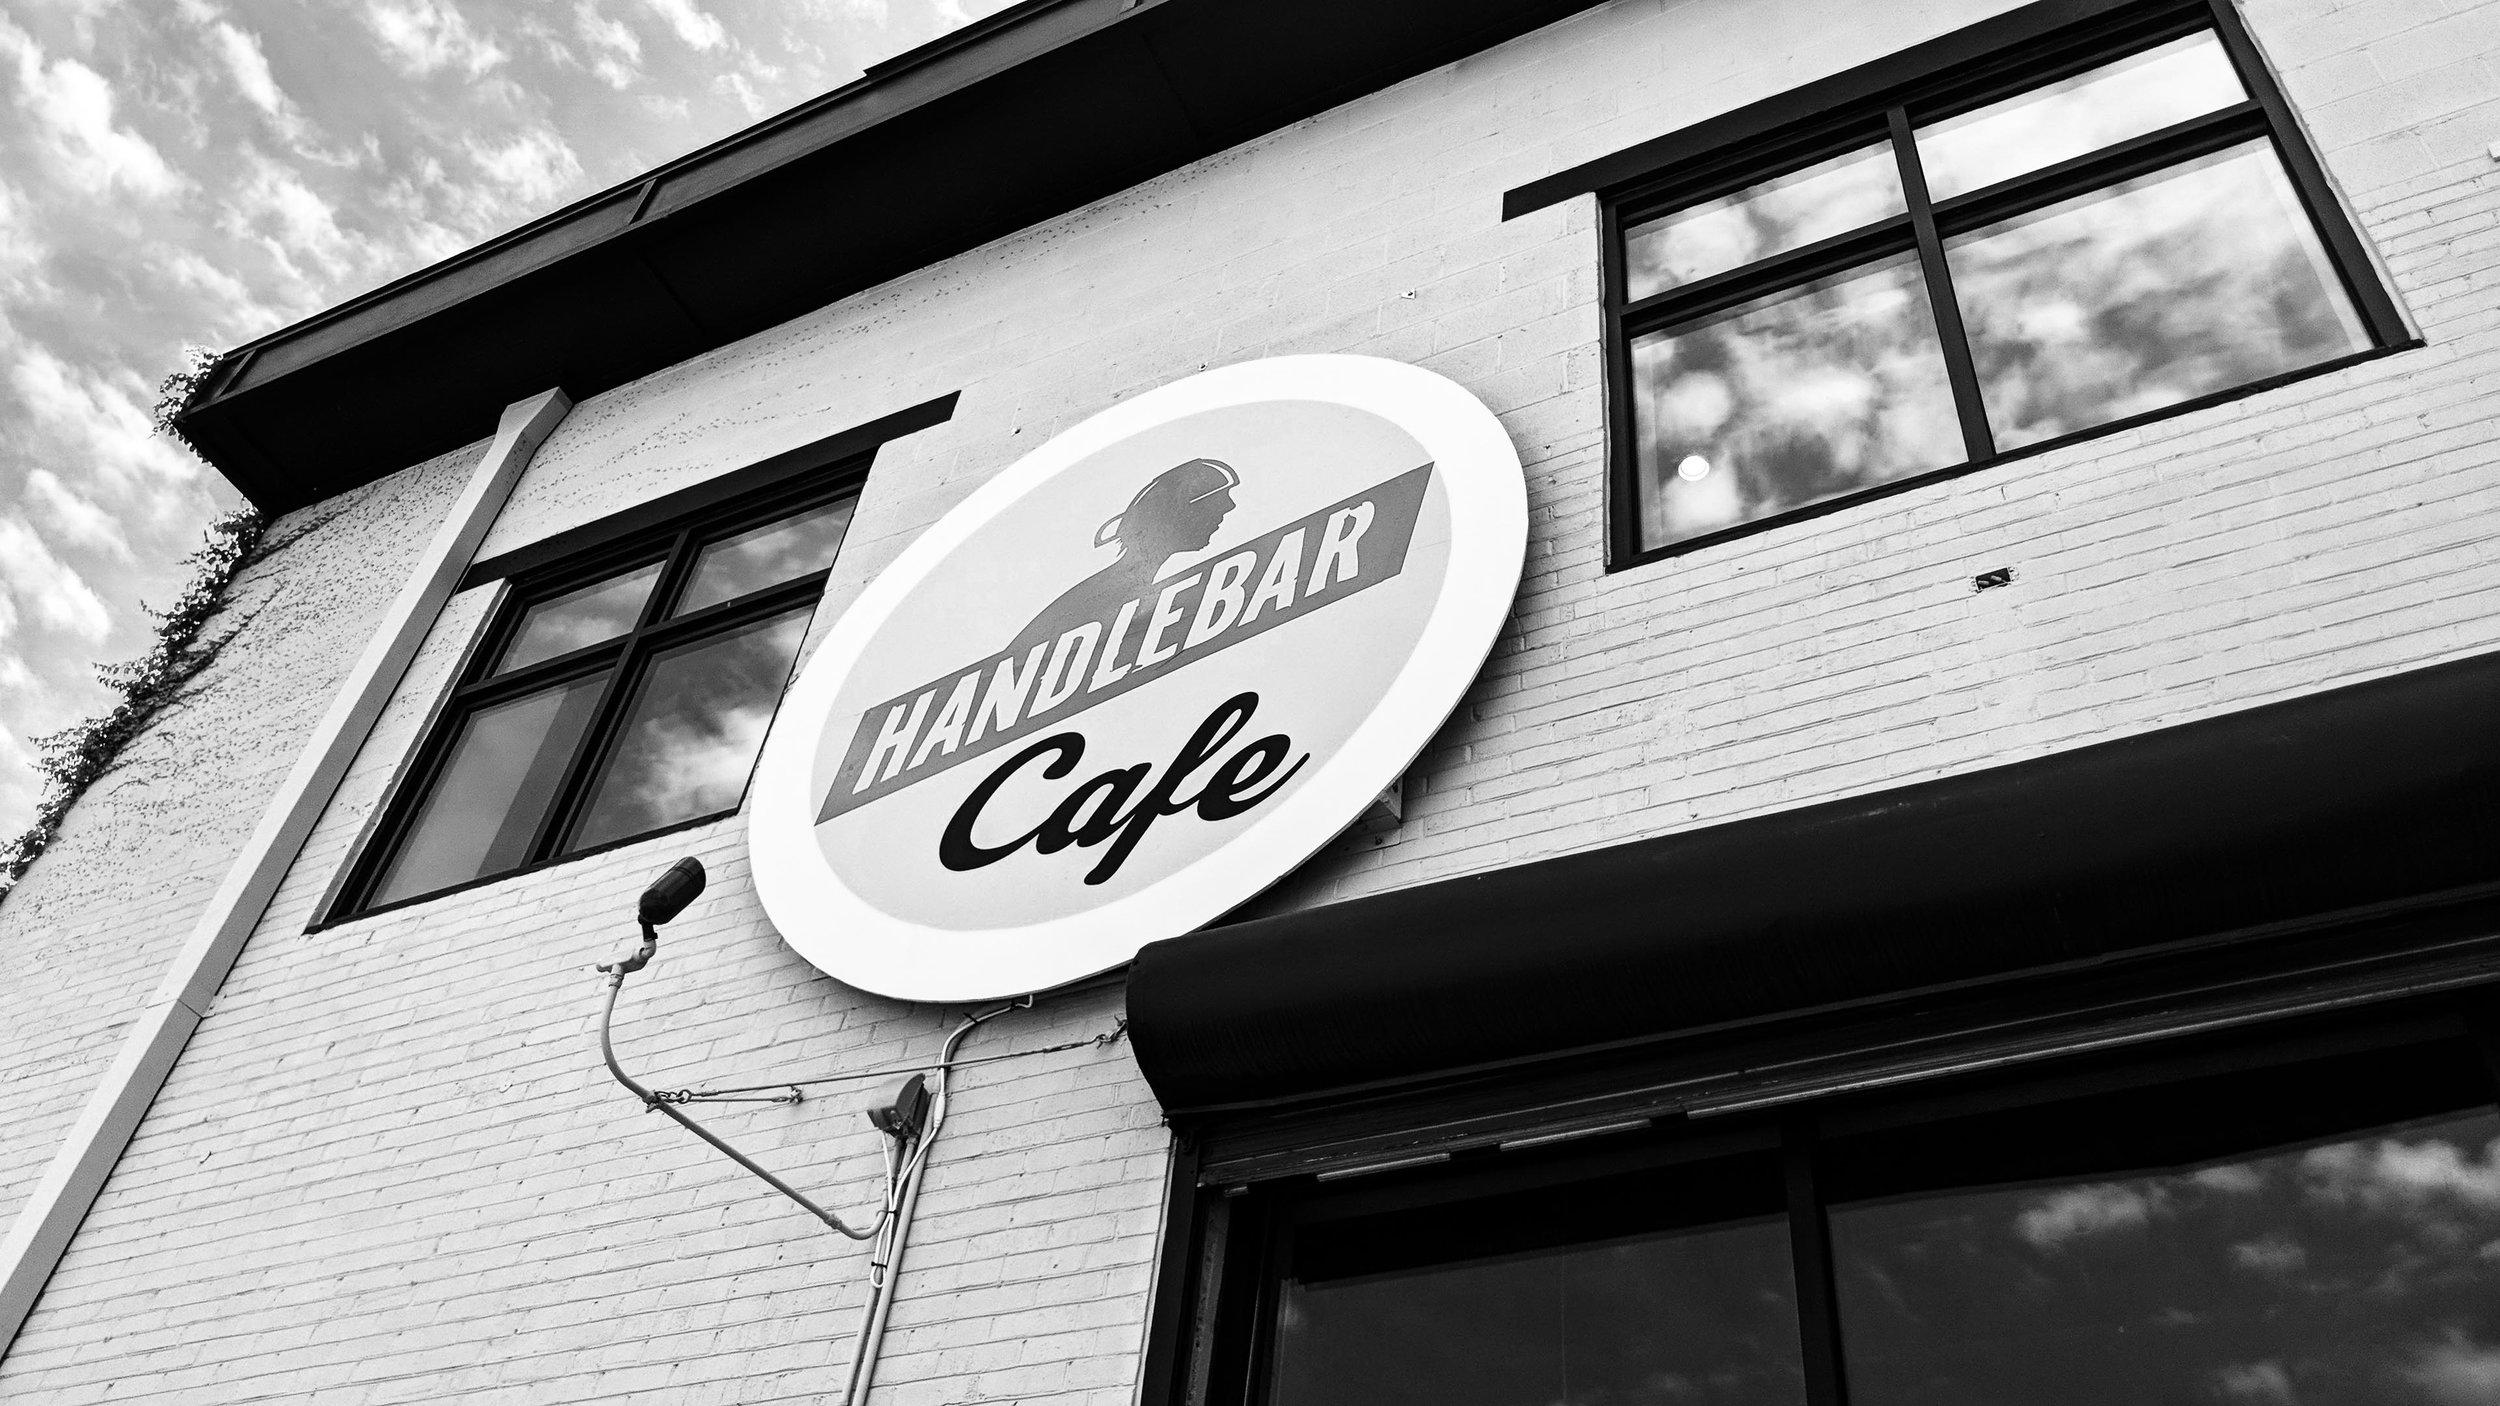 Handelbar Cafe